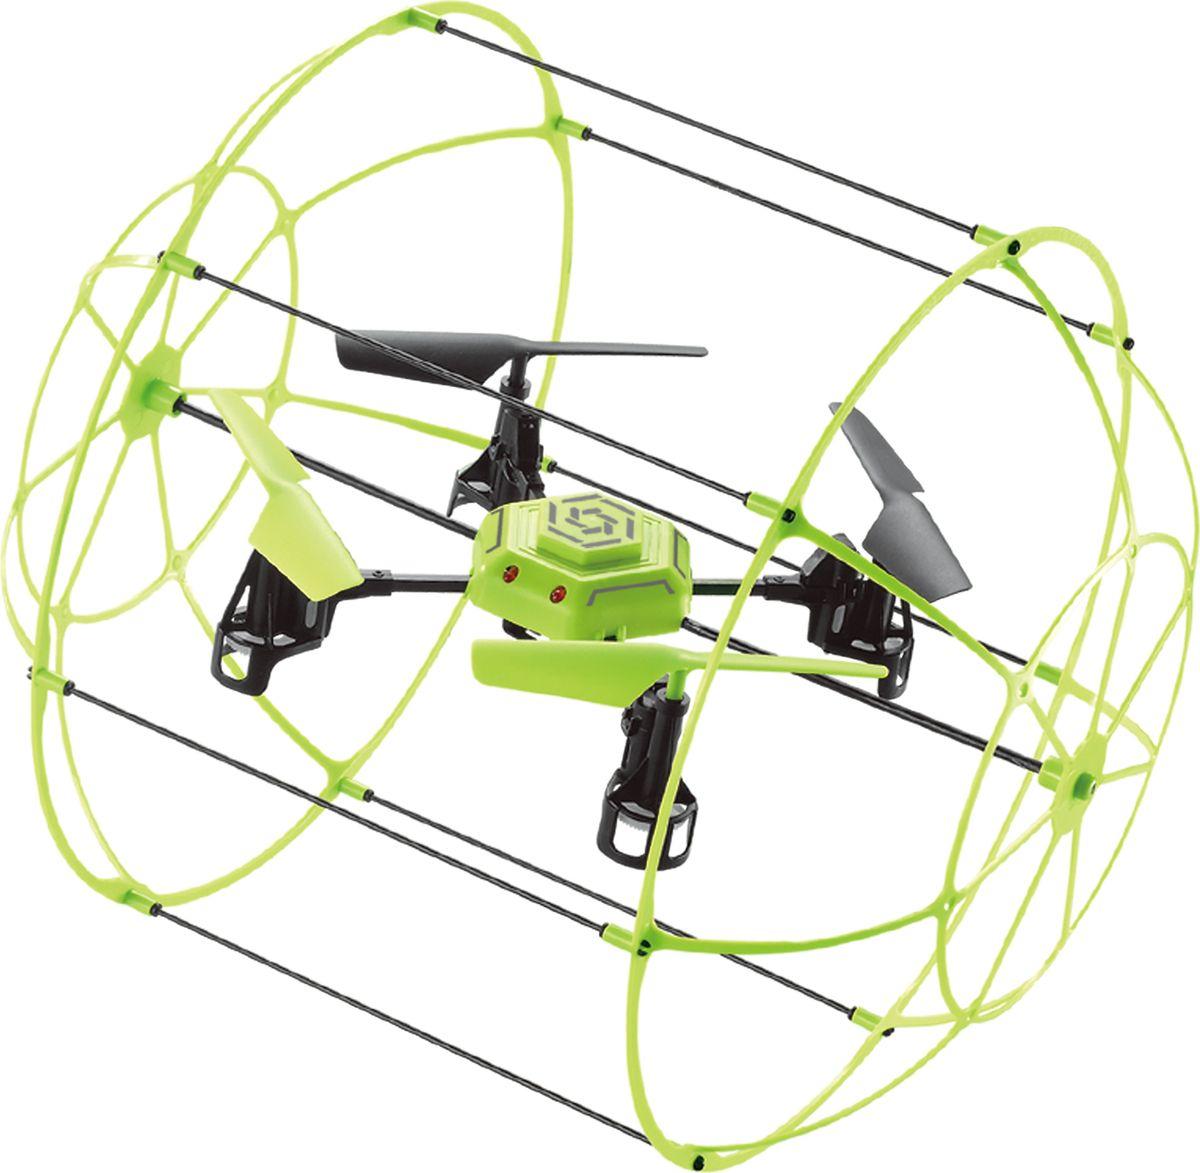 SkyWalker Квадрокоптер 1306 цвет зеленый